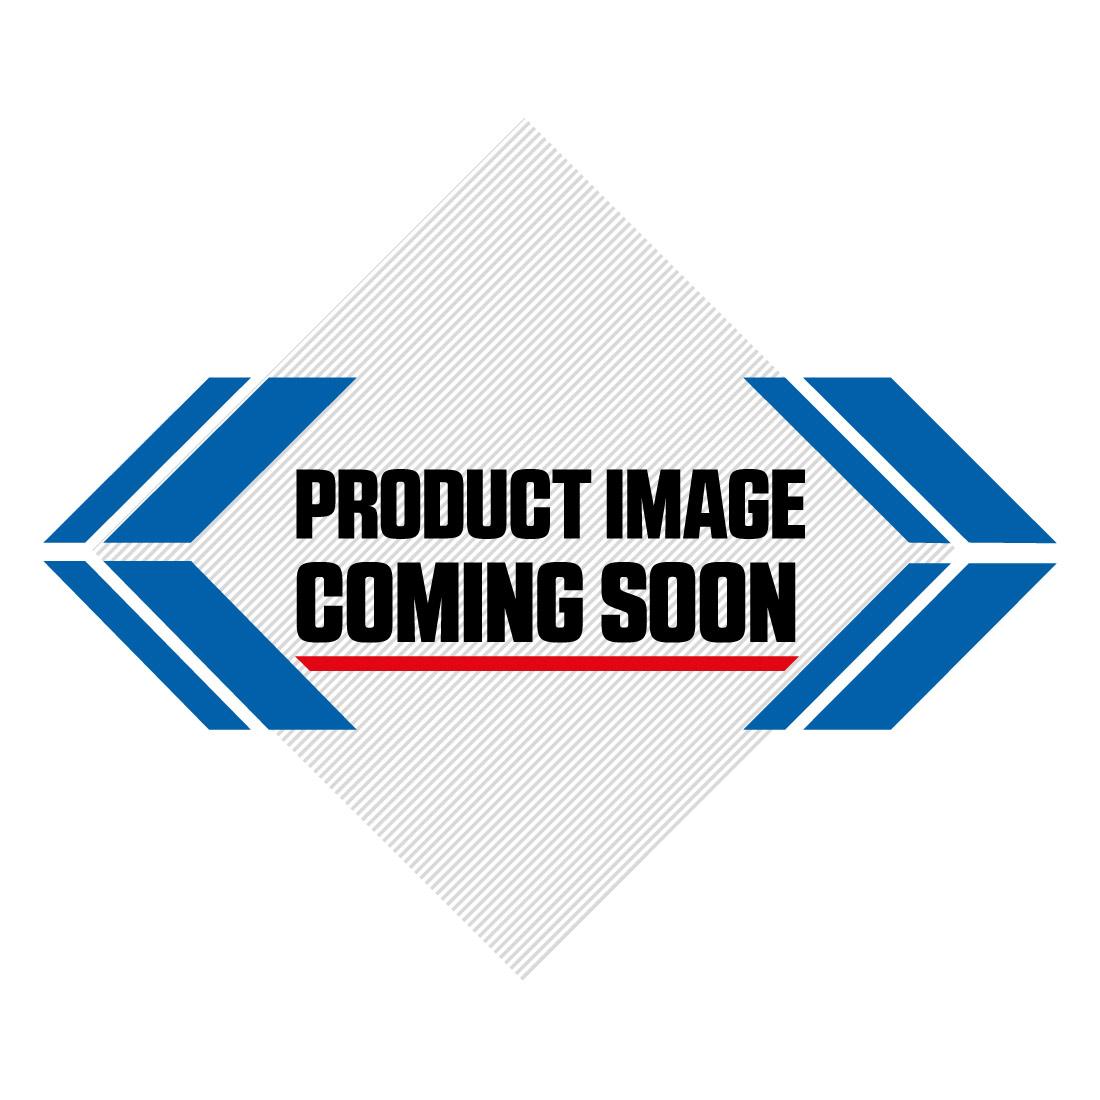 Renthal Twinring Rear Sprocket KTM SX SX-F EXC EXC-F Husqvarna TC FC TE FE - Orange Image-1>